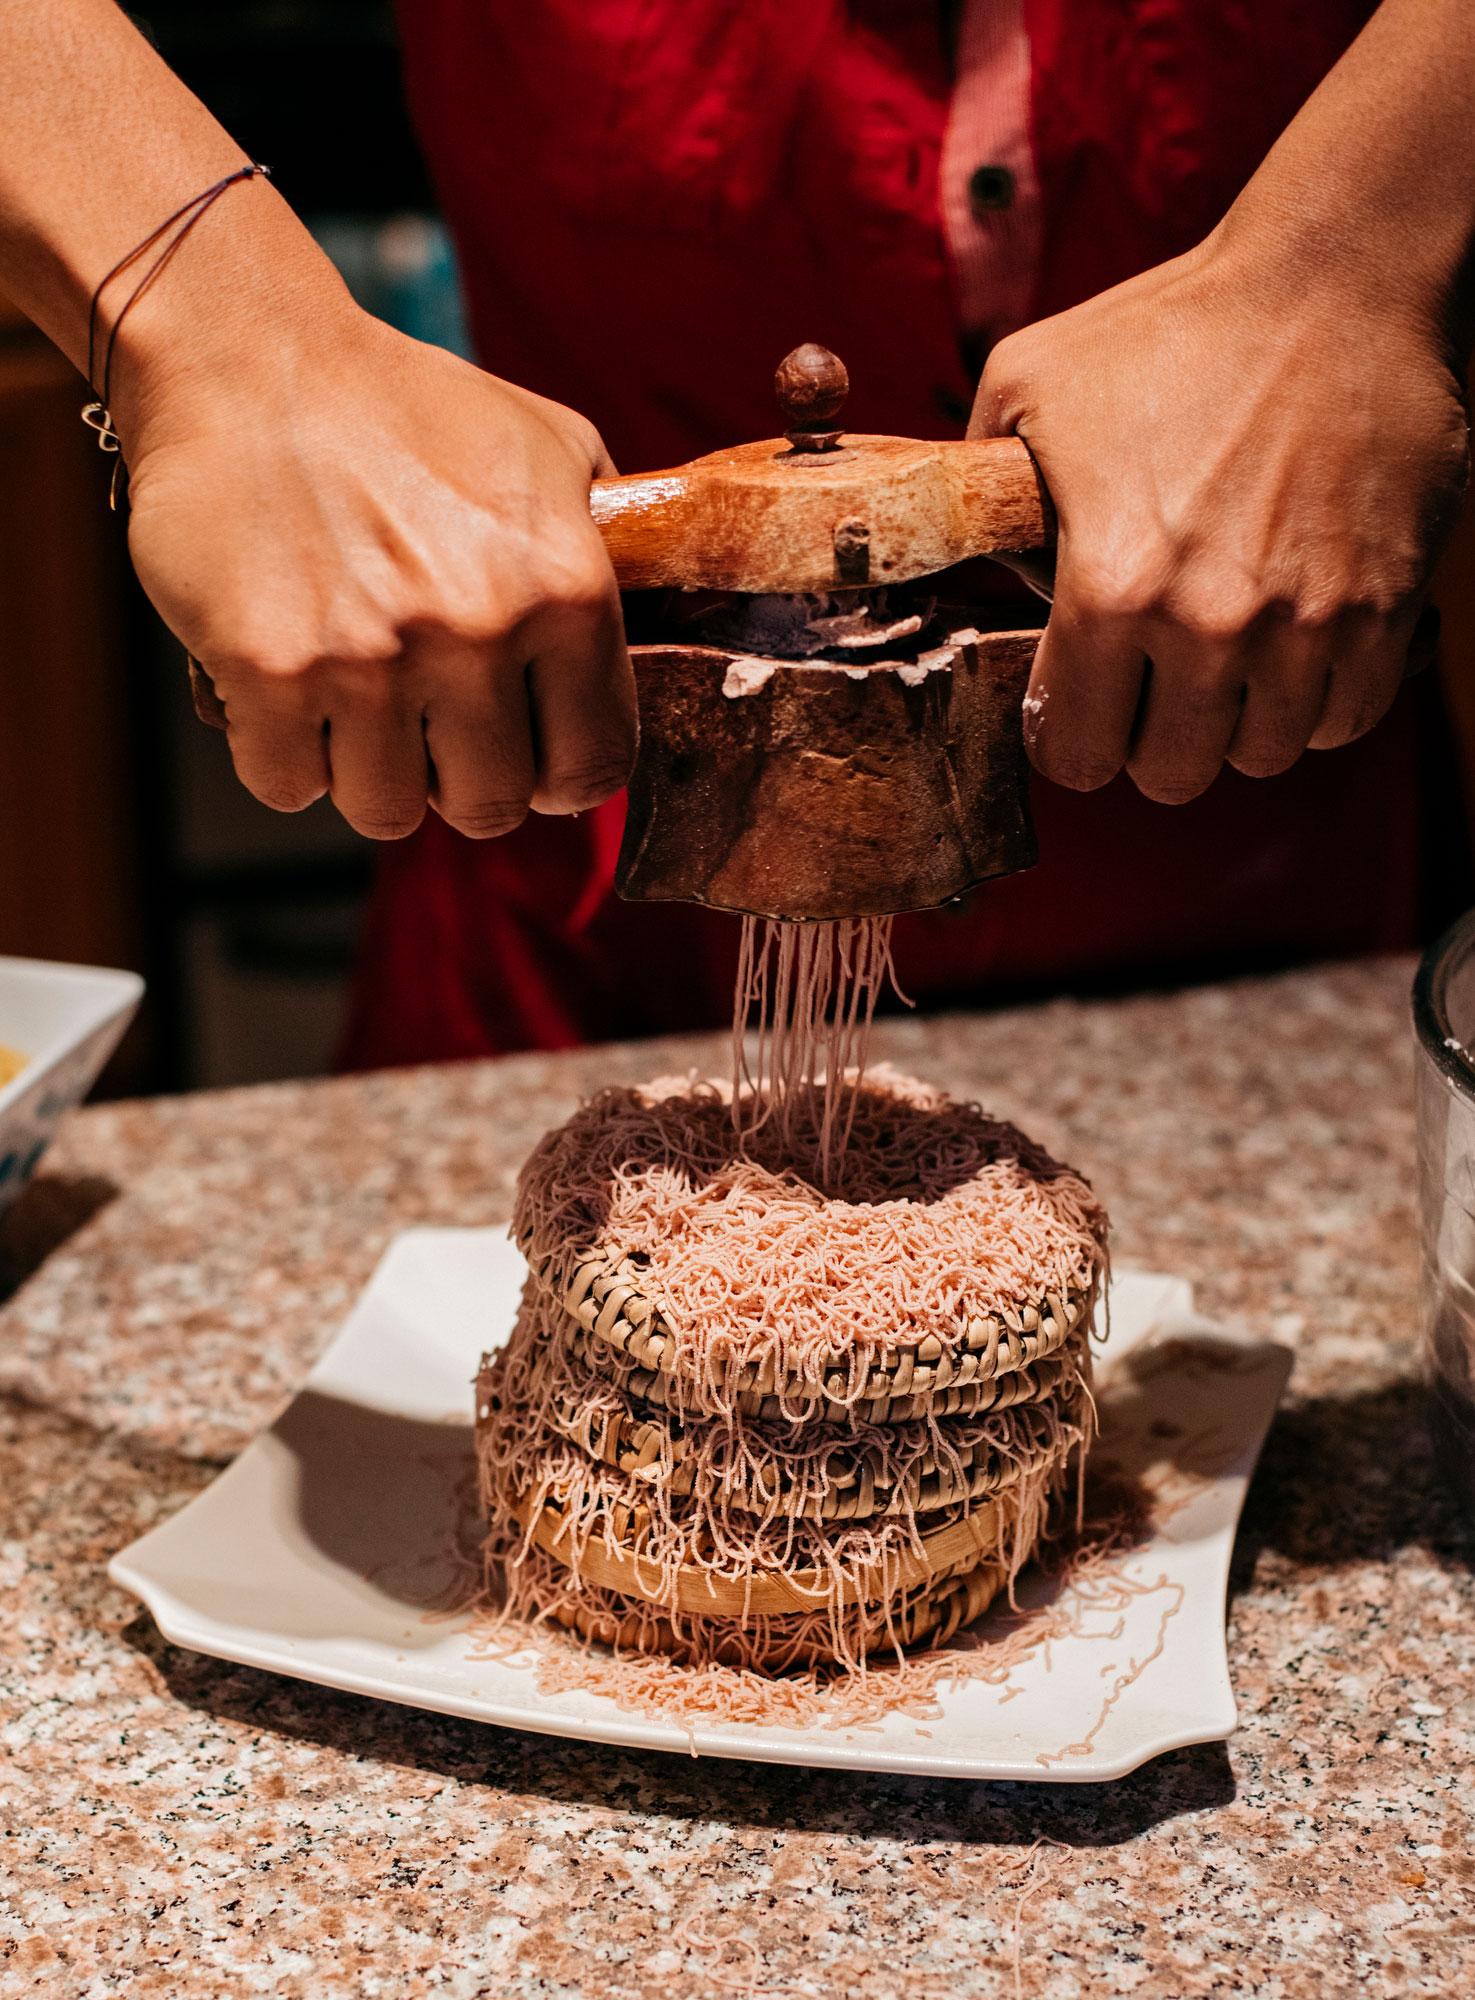 Los_Angeles_Food_photographer_Rebecca_Peloquin_Sri_Lankan_Food_015.JPG